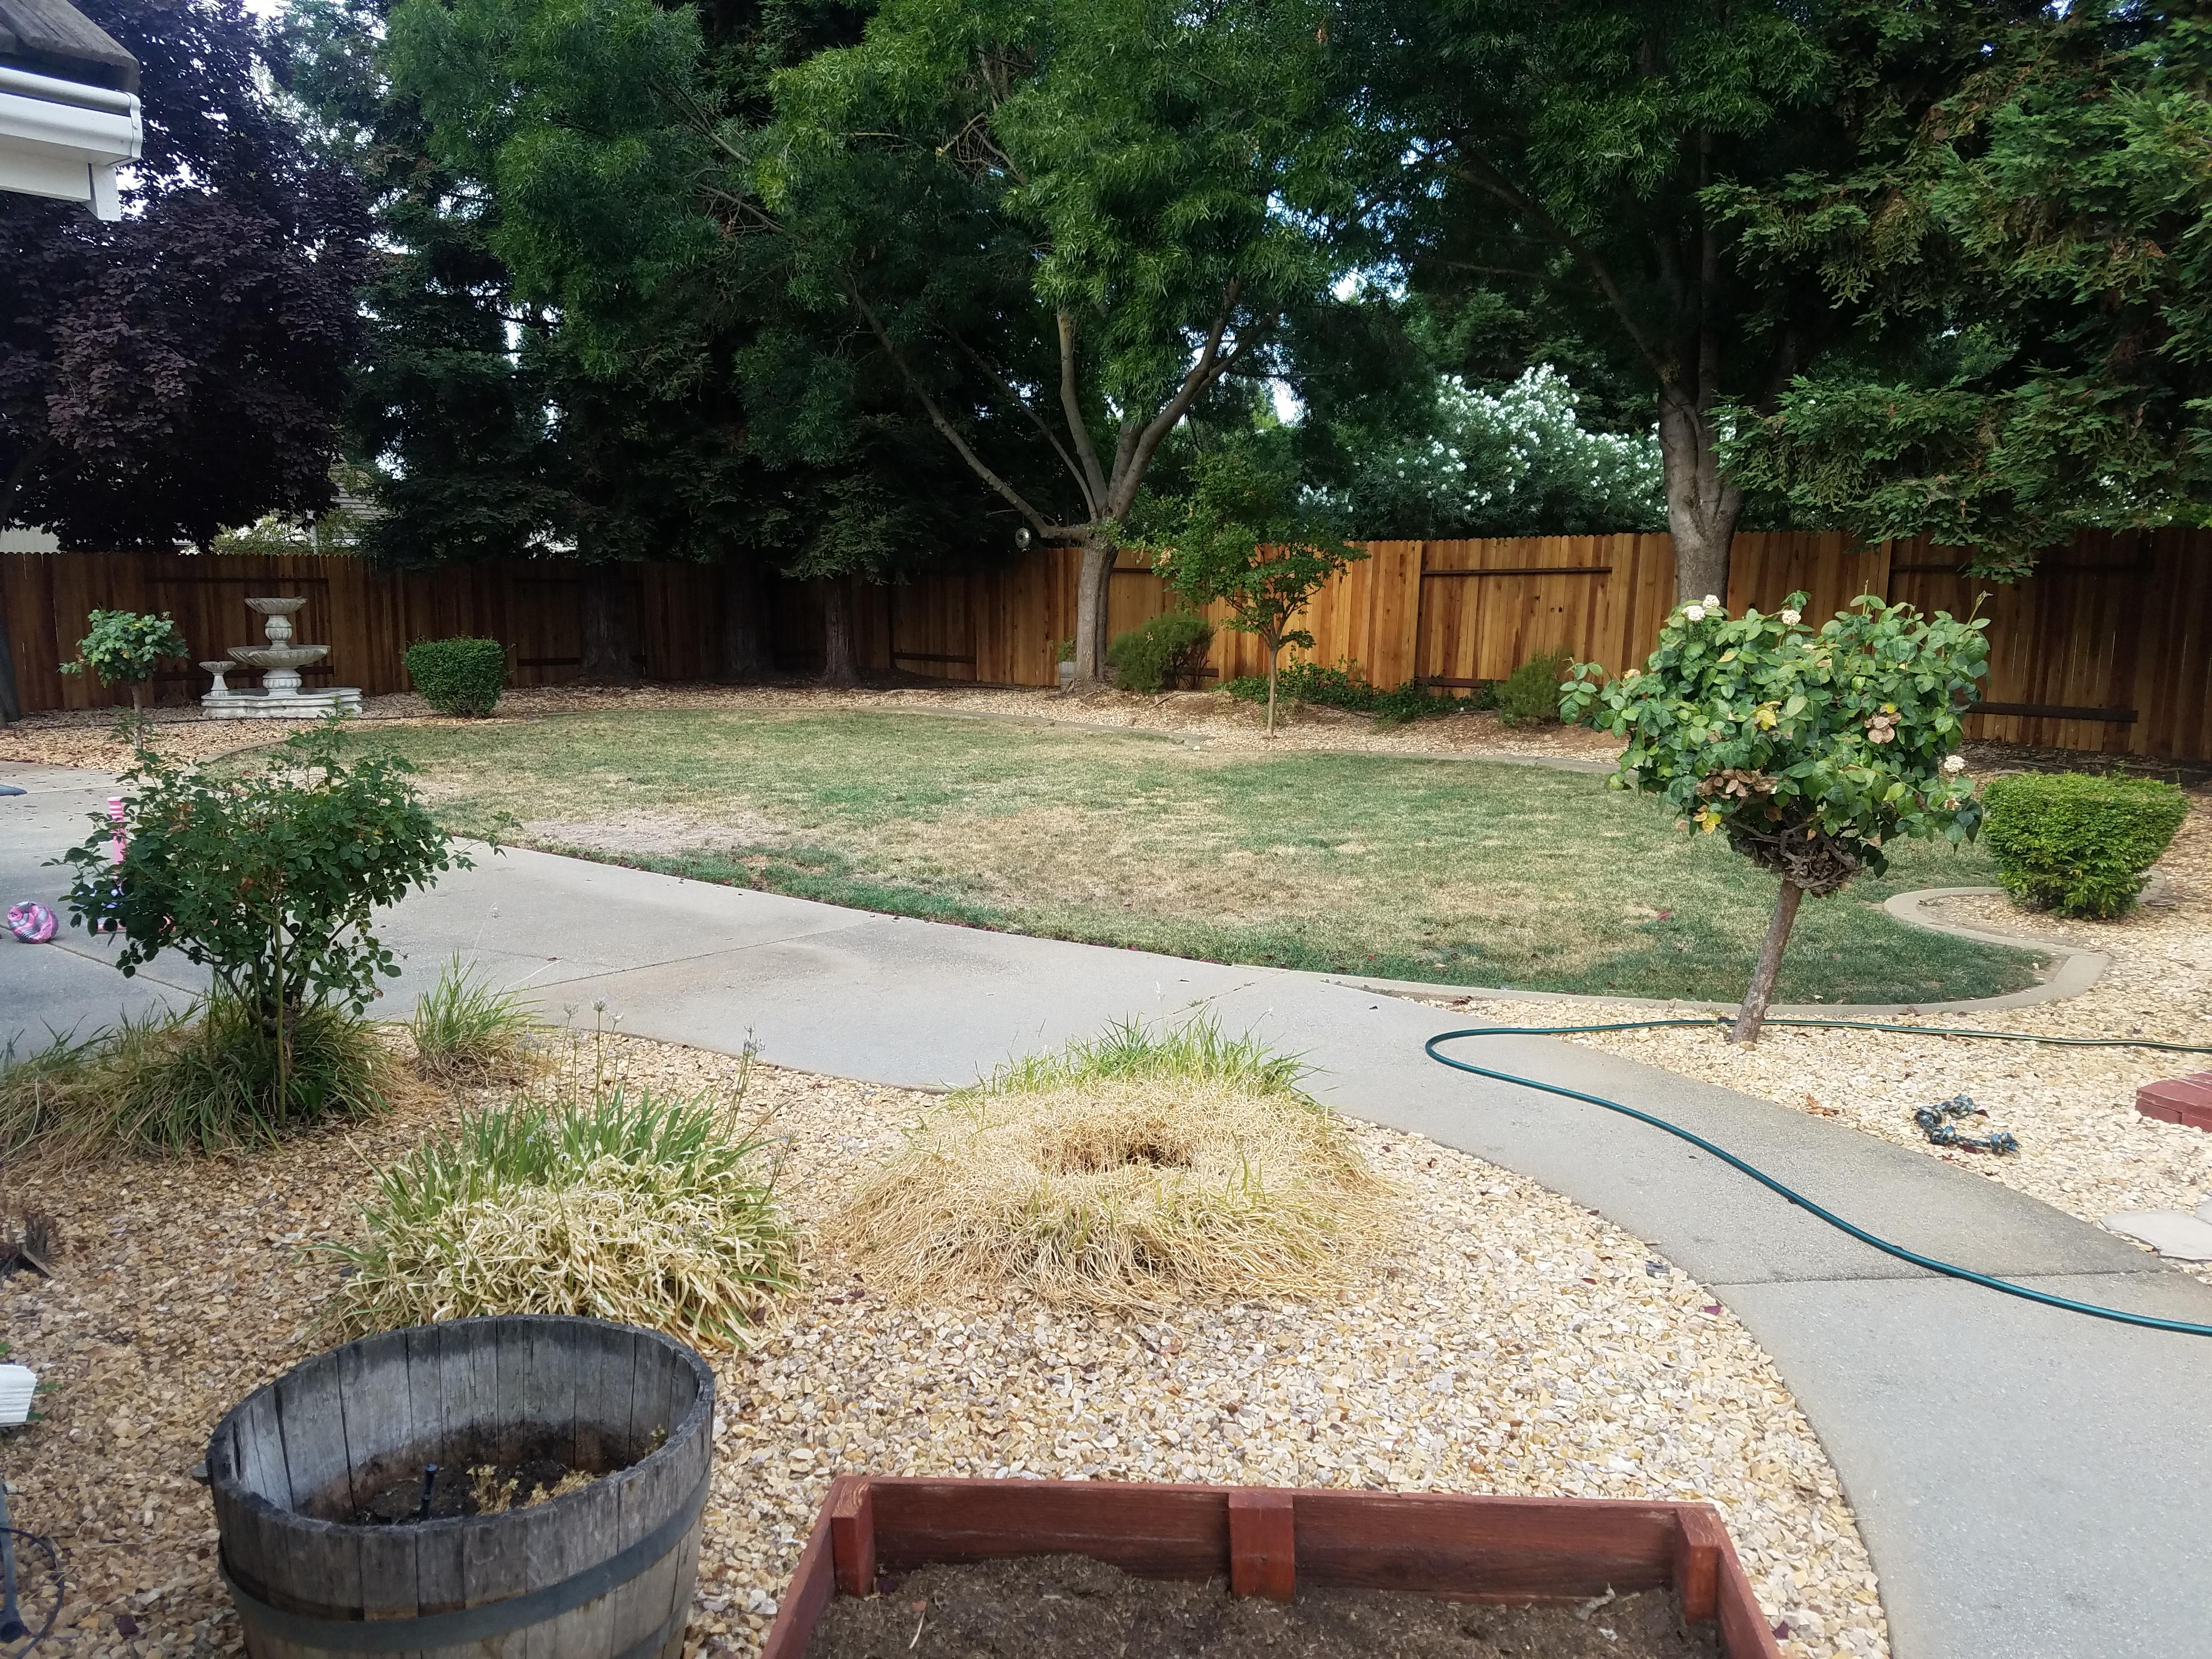 Backyard View 4 - Original Yard